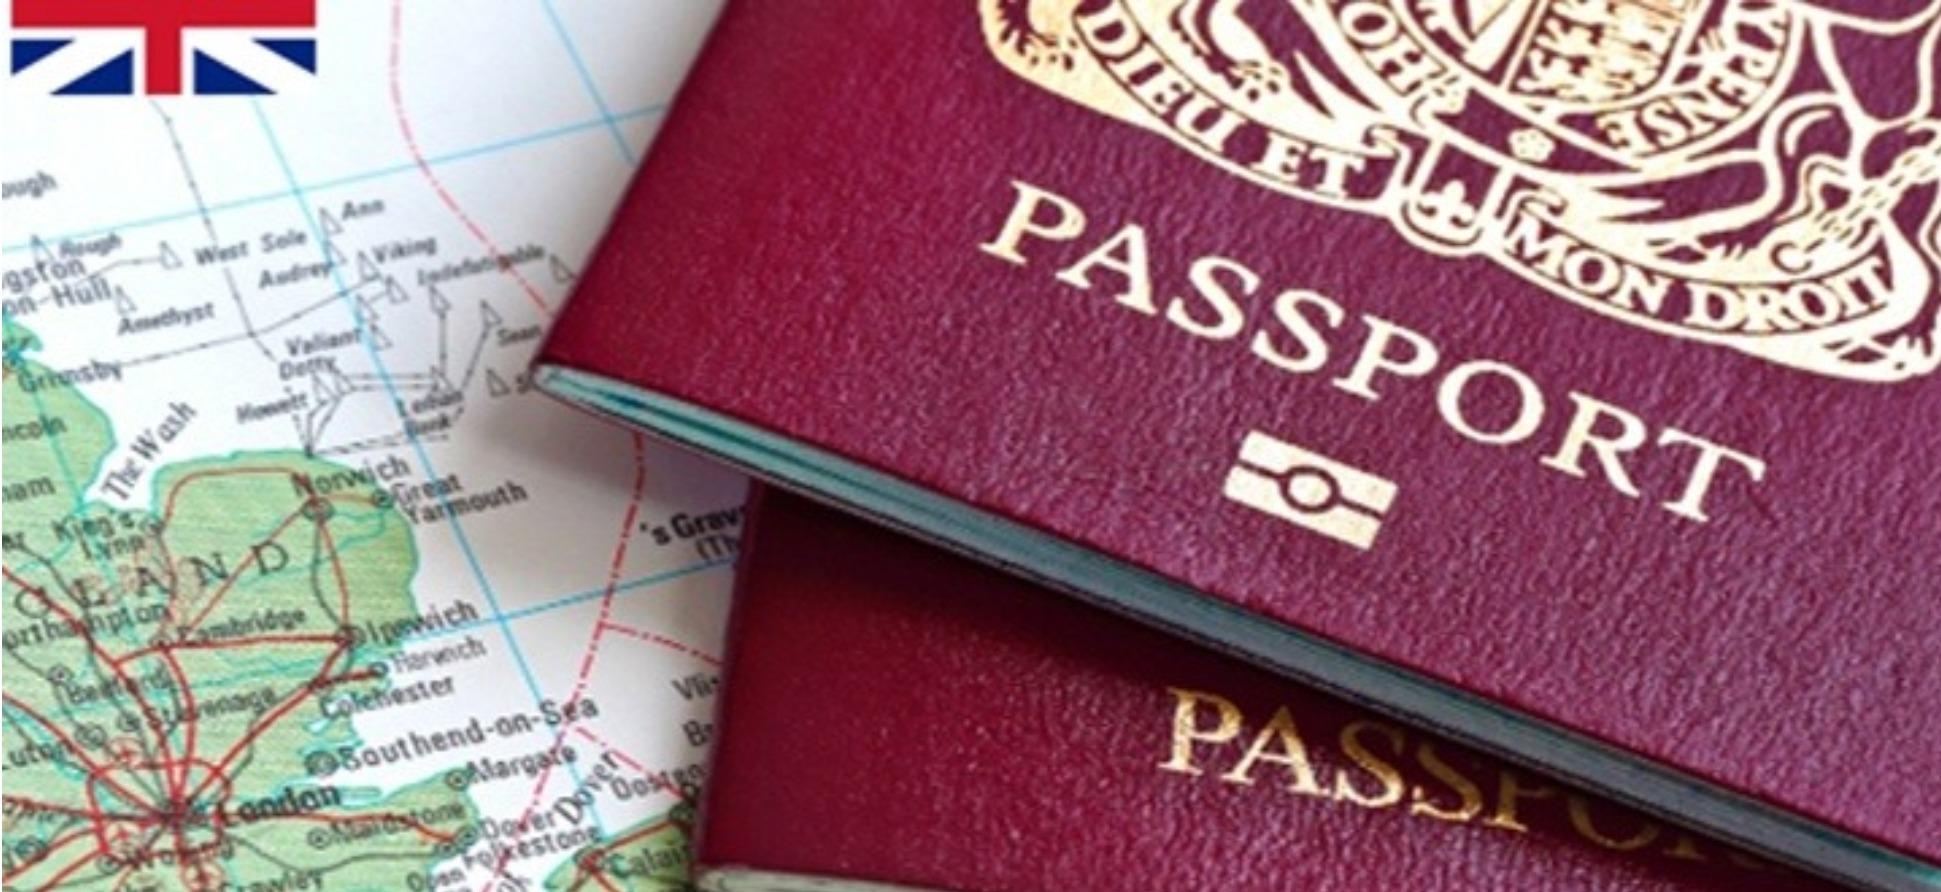 UK's New Visa Launched: Benefits for Overseas Scientists & Academics